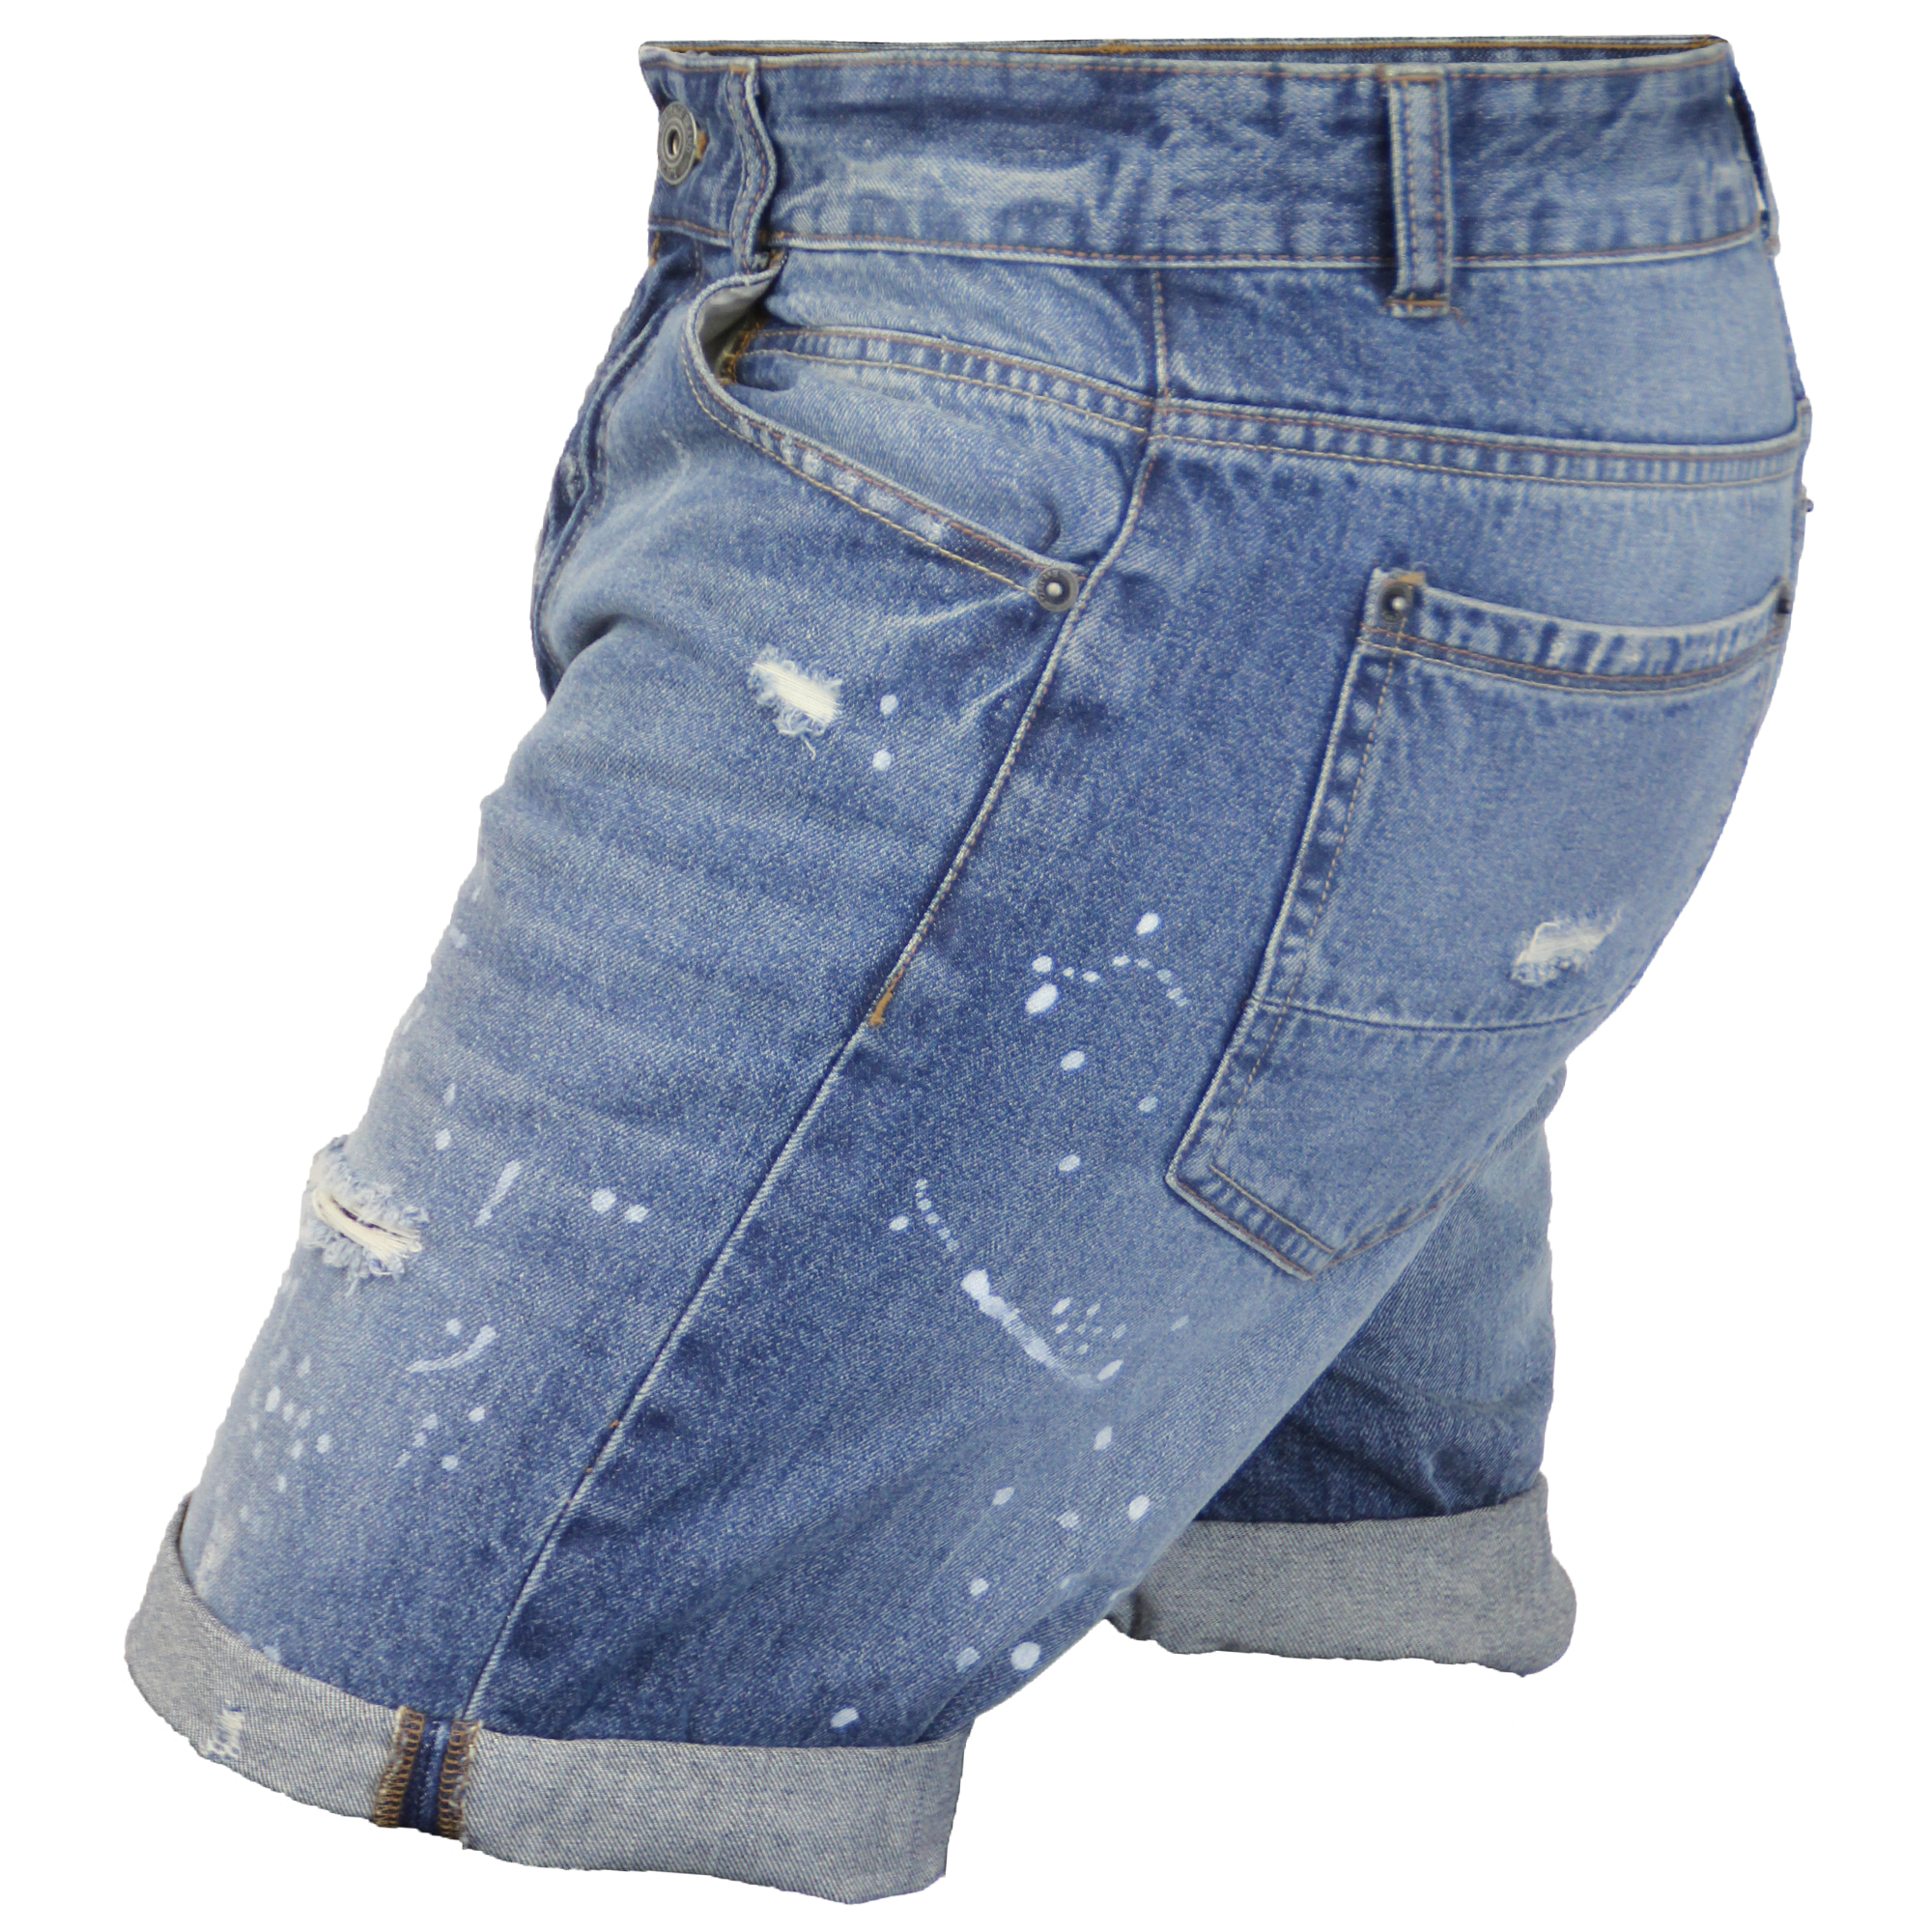 d29582de3d Mens Ripped Denim Shorts Brave Soul Gregor Pants Jack Knee Length ...